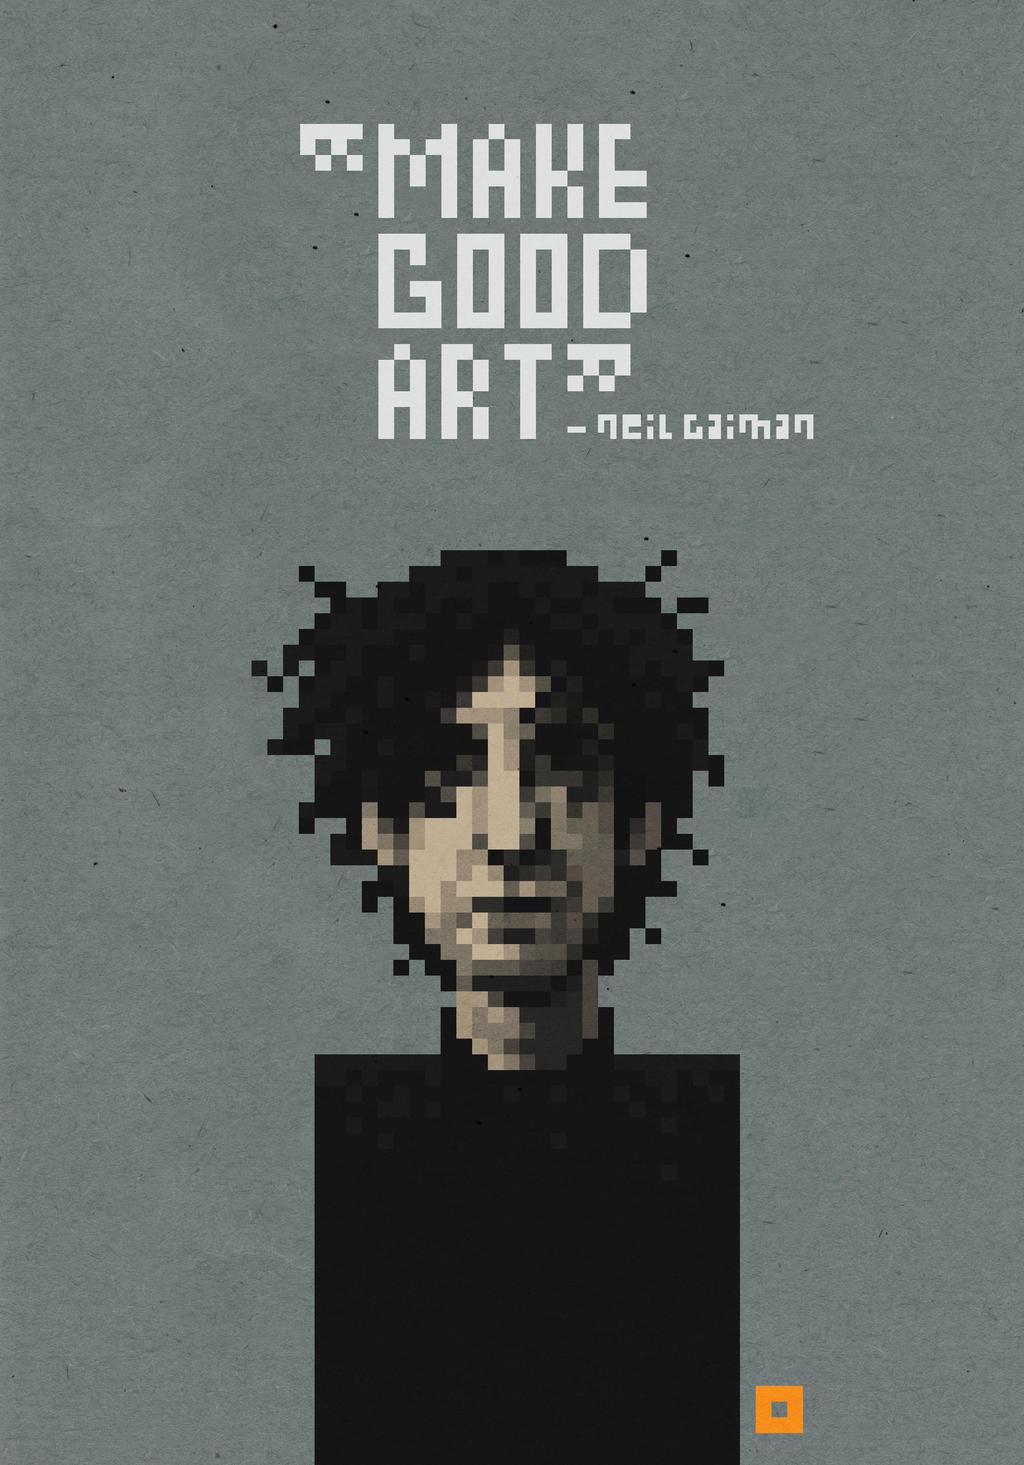 Neil Gaiman by solitarium